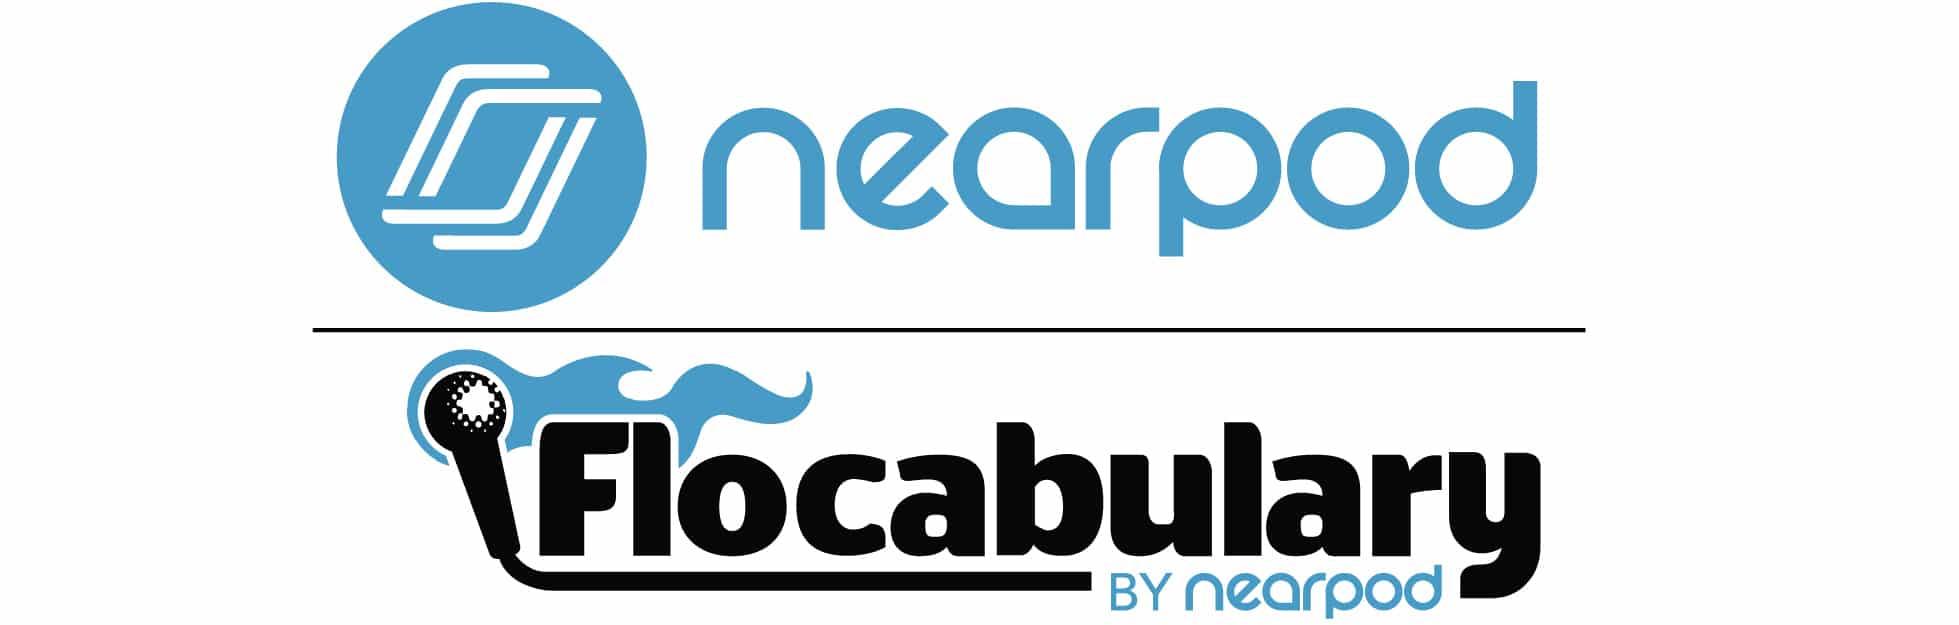 nearpod.flocab logo